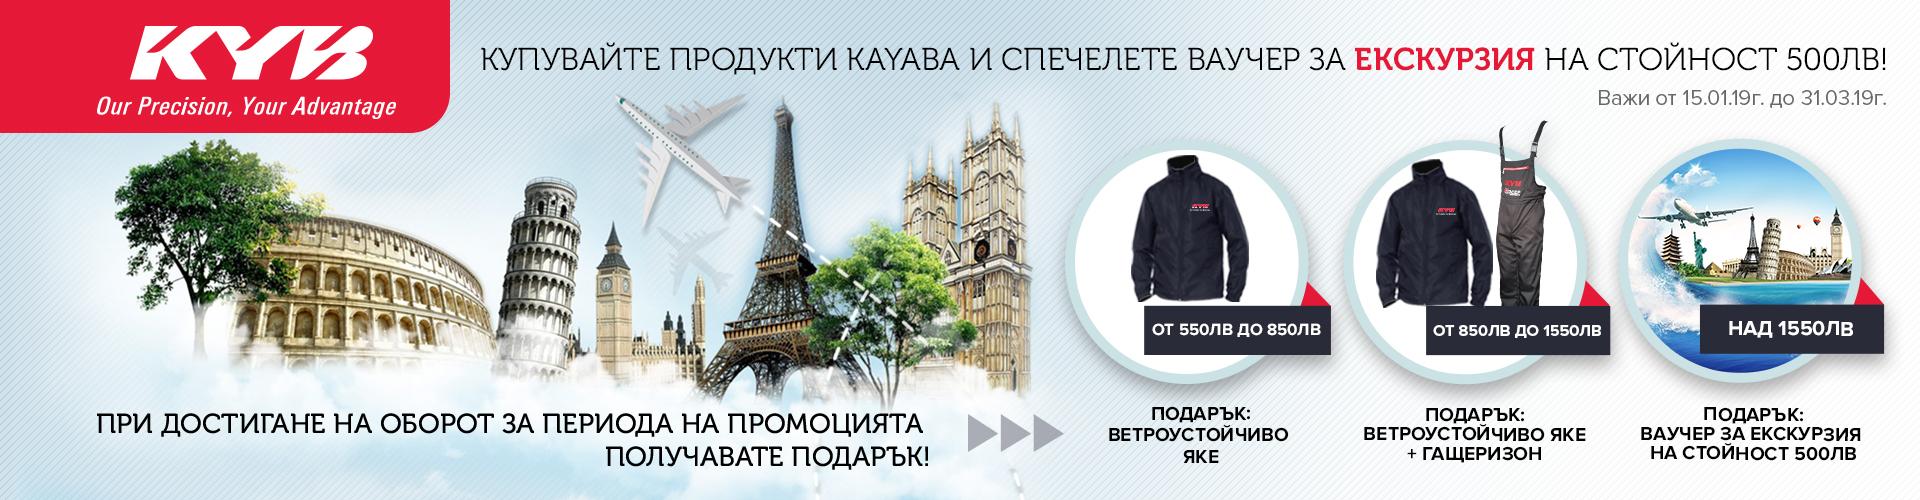 promo_kayaba_15012019-31032019_banner.jpg